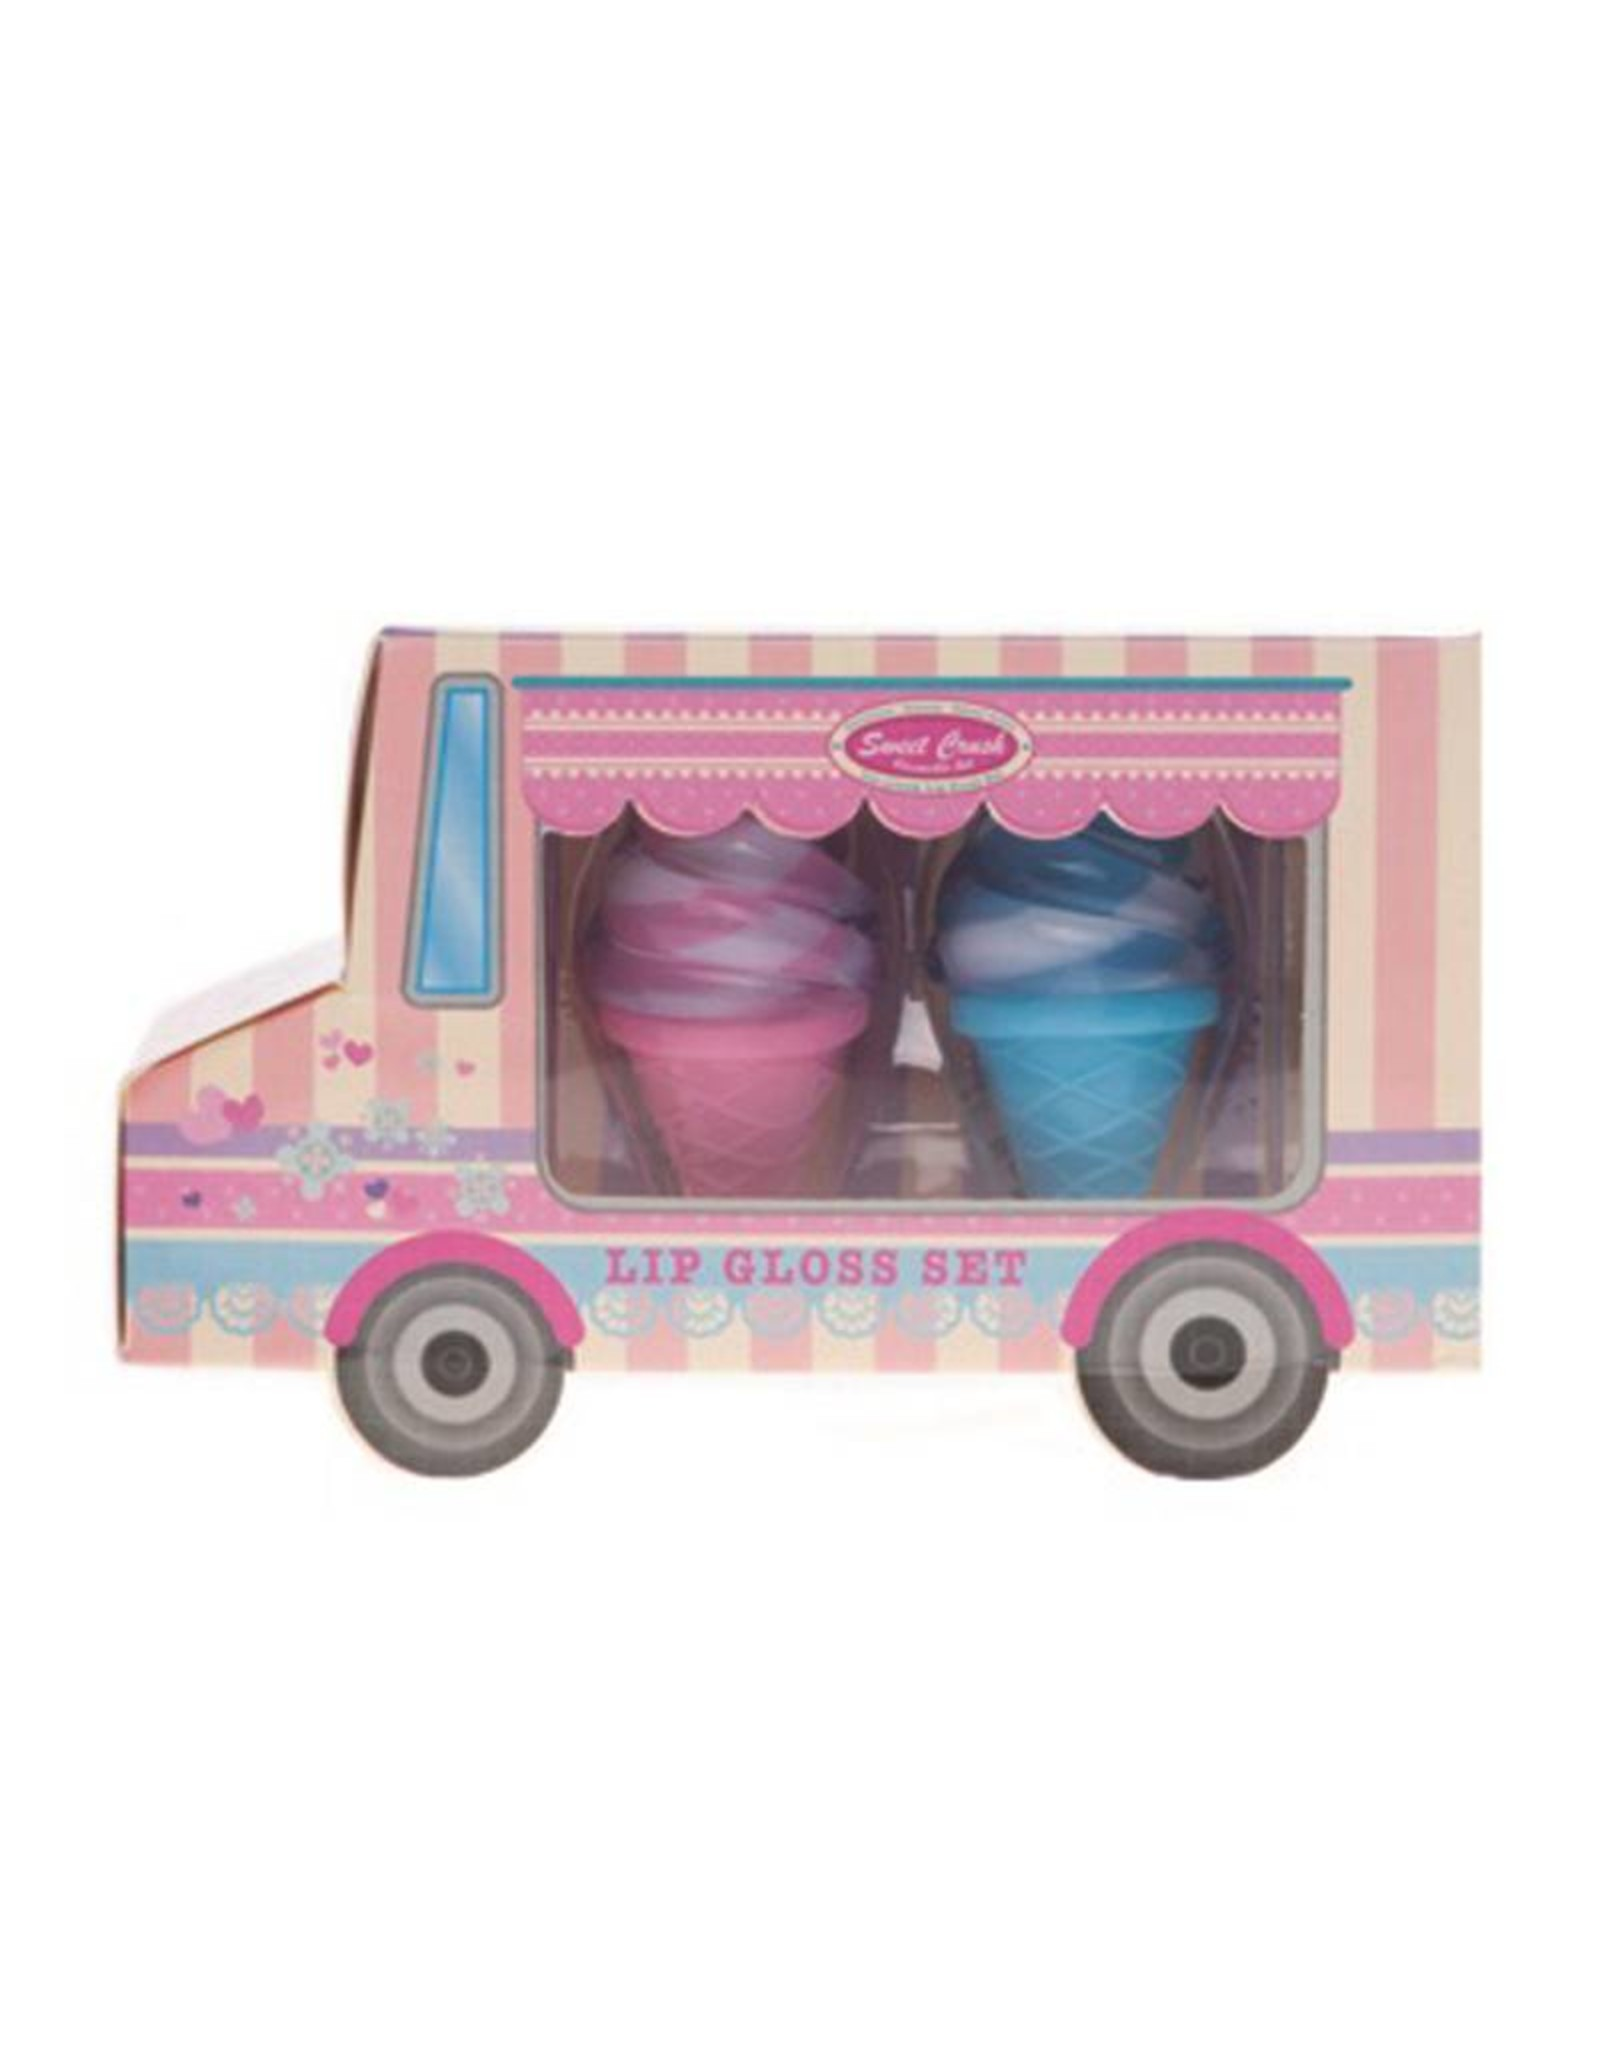 Lipgloss 'IJsjes' set - Body & Soap